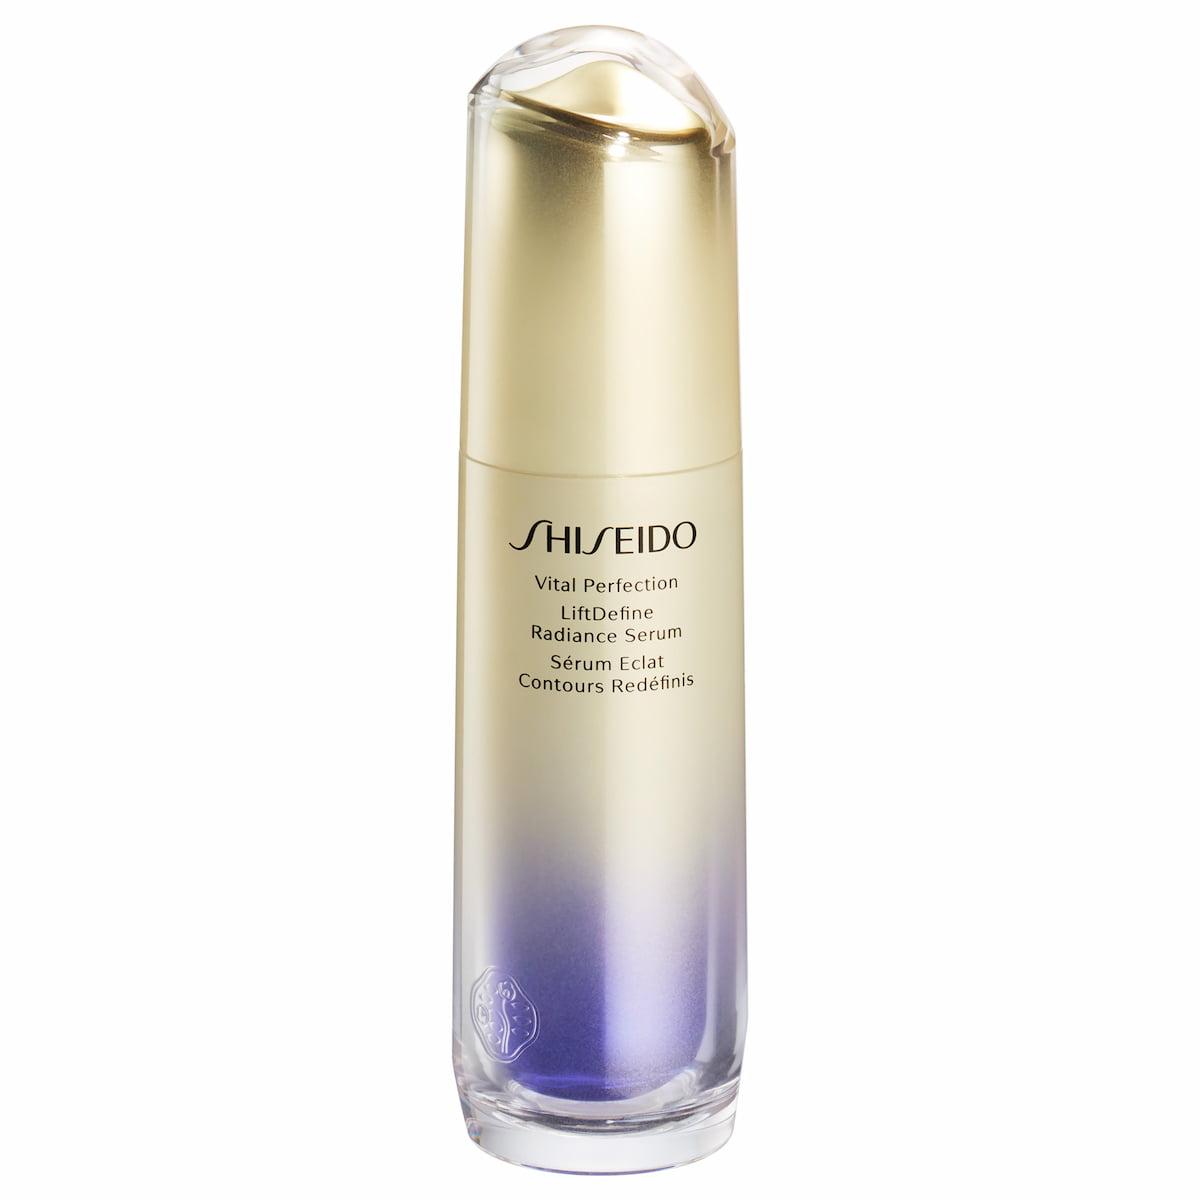 Shiseido Vital Perfection Sérum